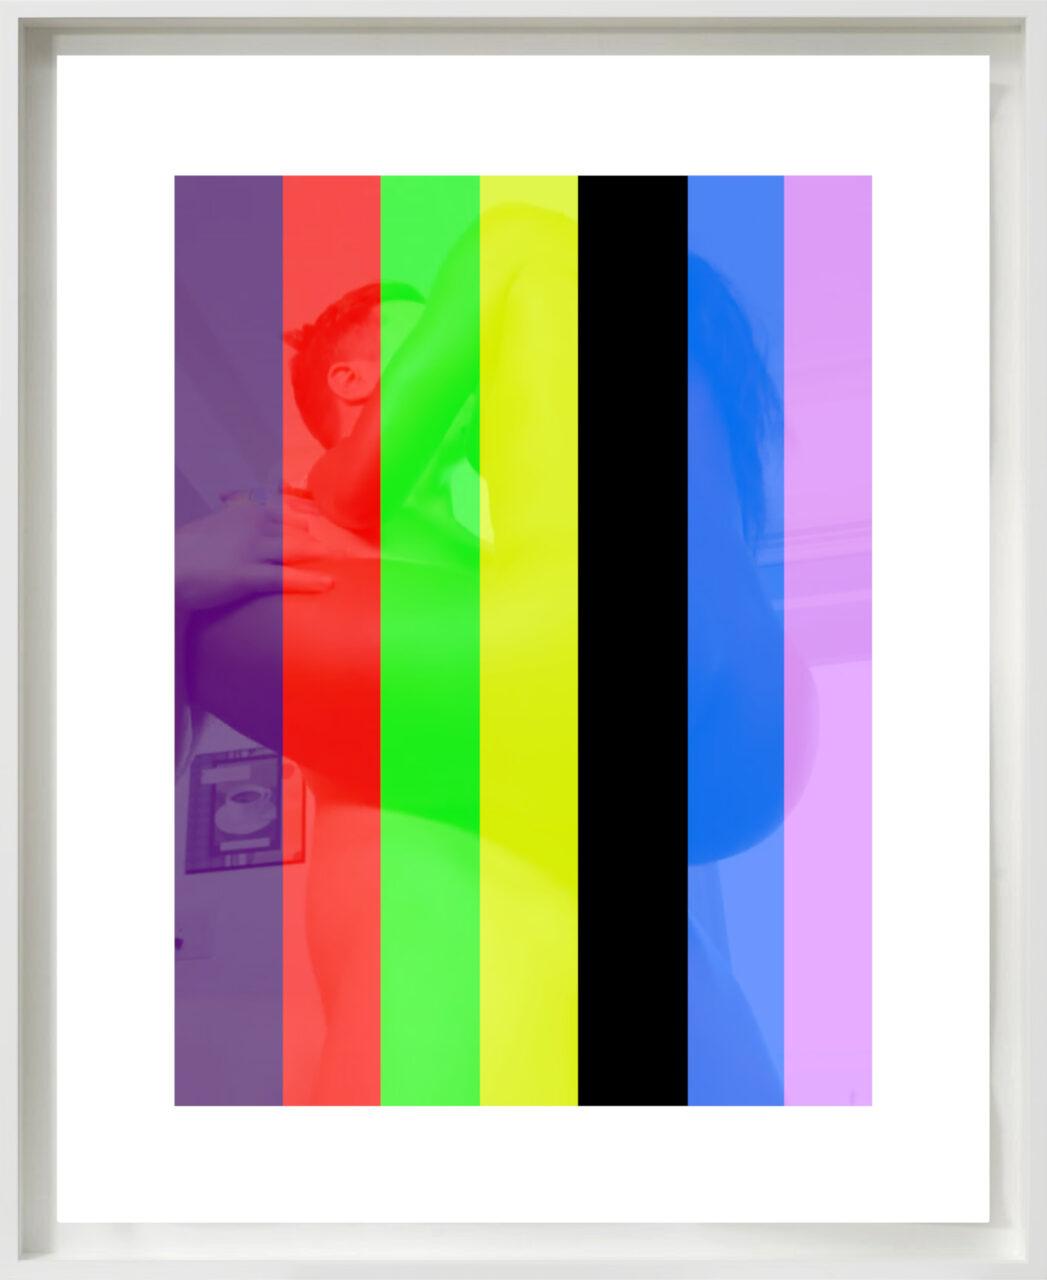 Streifenbild (Censorship by Formalism), c-print, 40 x 30 cm + border